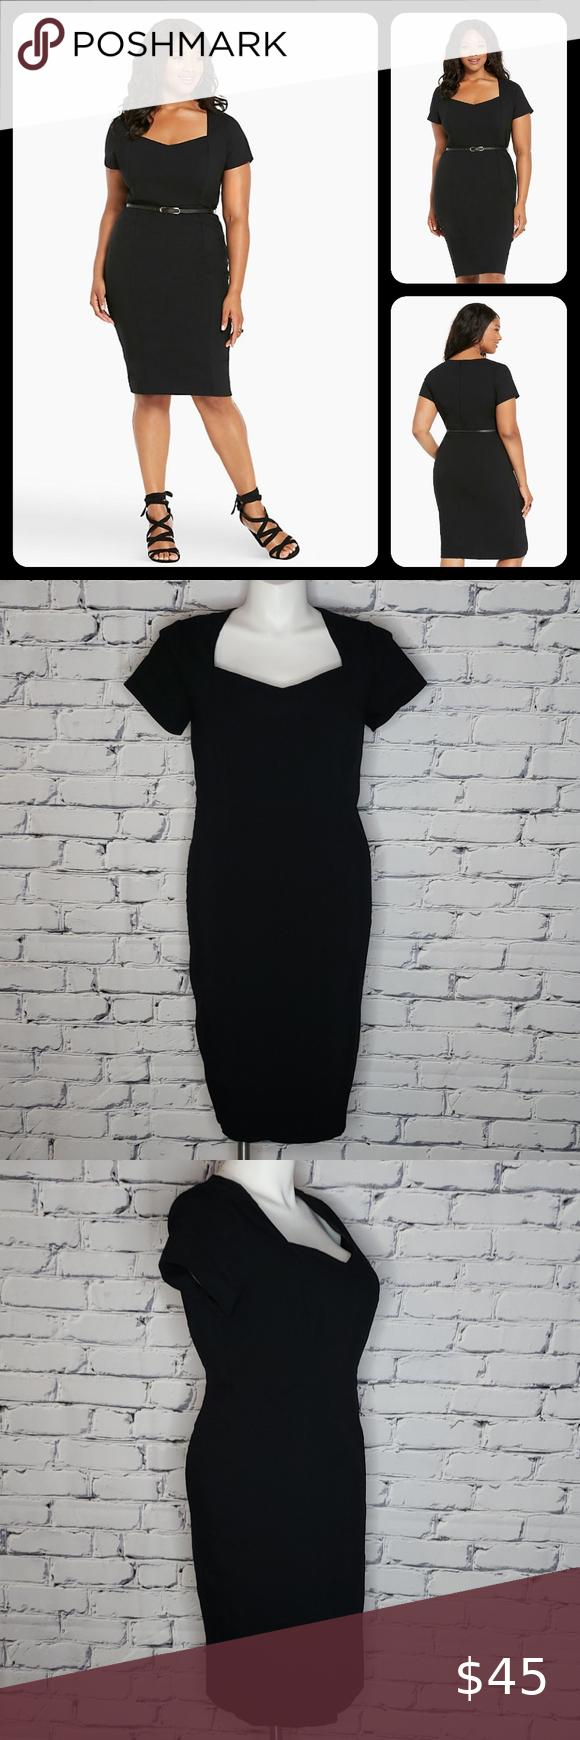 Torrid Little Black Dress Little Black Dress Black Dress Workwear Dress [ 1740 x 580 Pixel ]